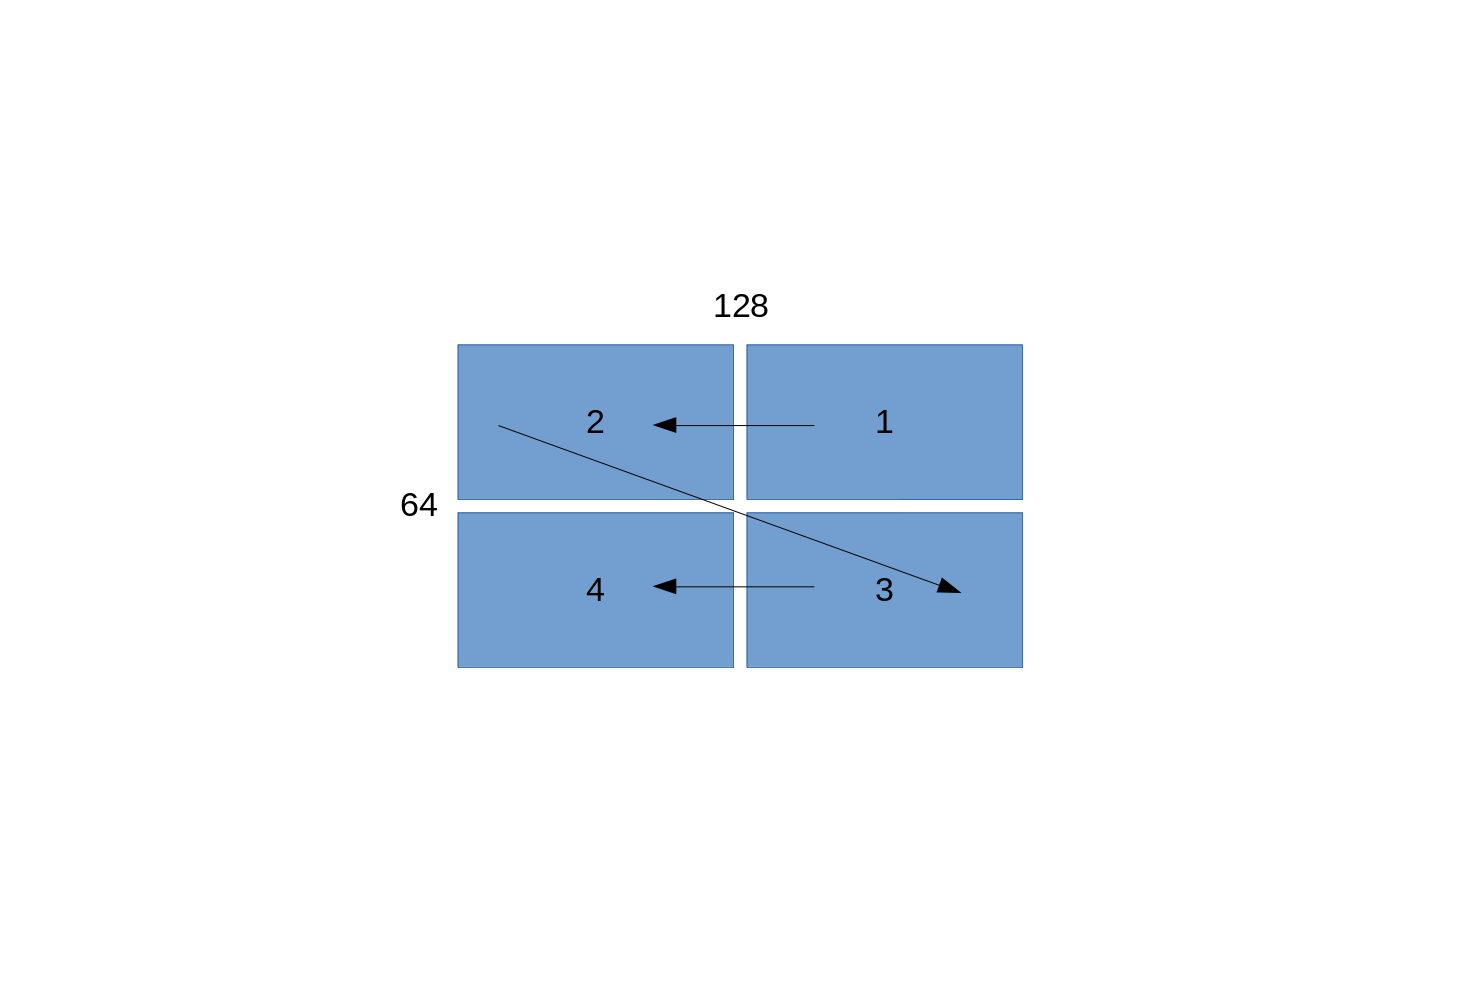 led_matrices_ksnip_20210128-112516.png